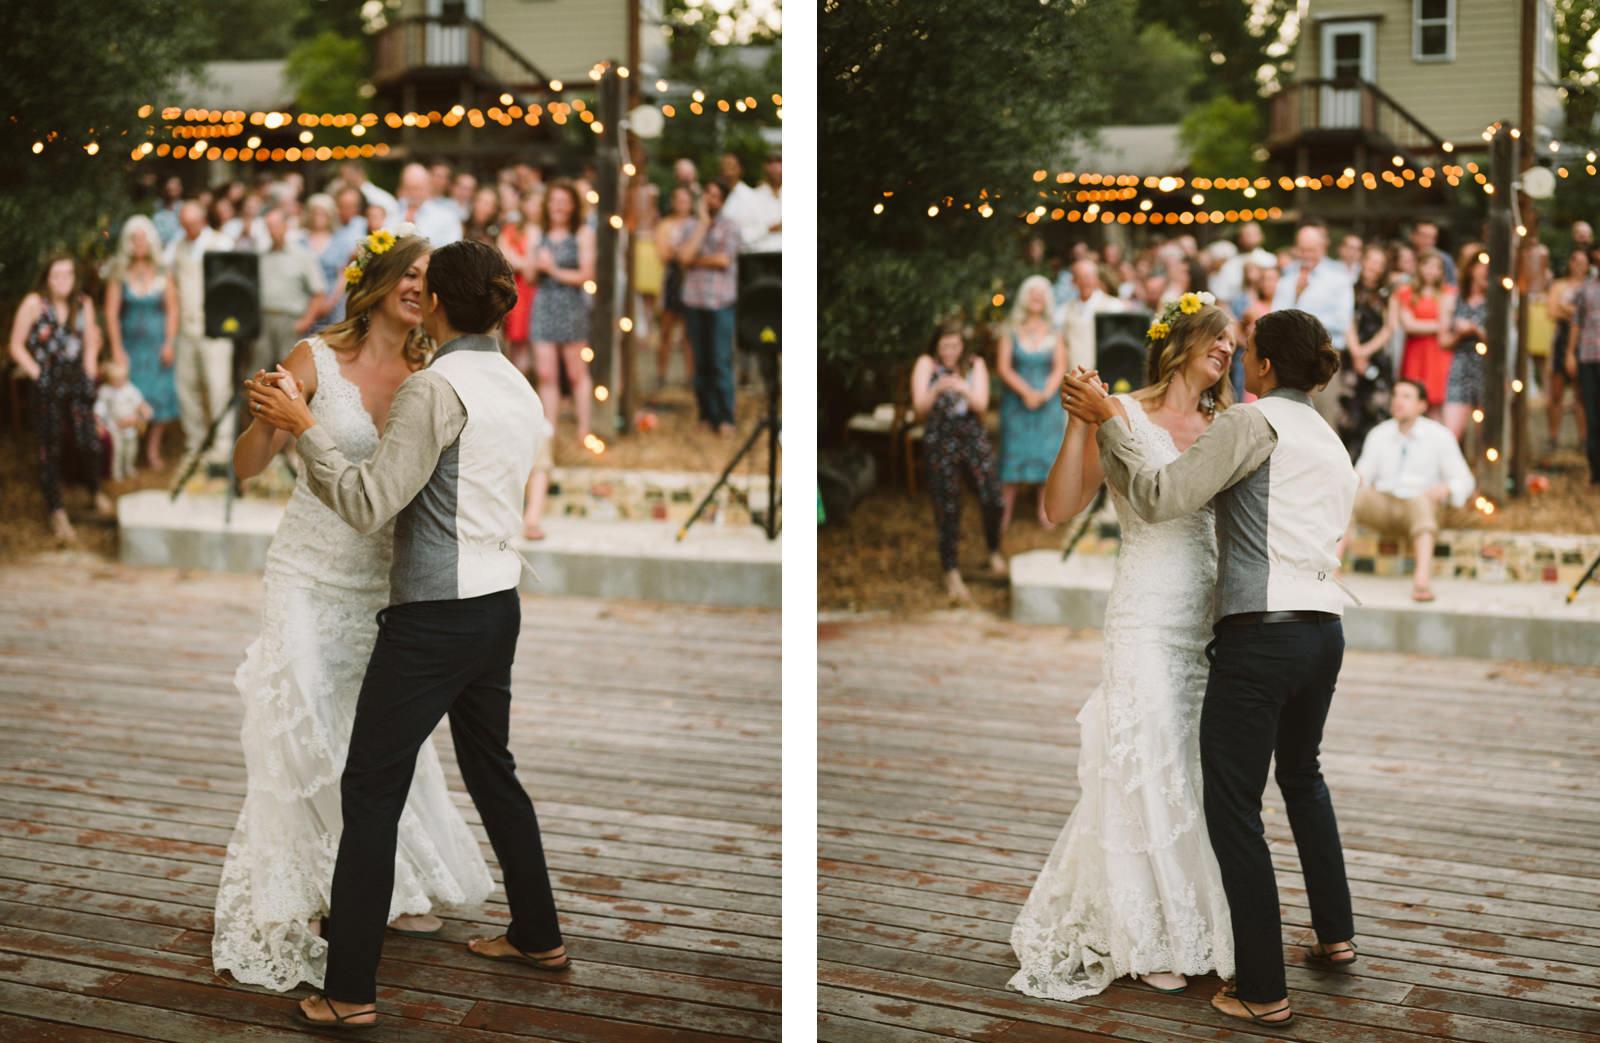 rivers-bend-retreat-wedding-098 RIVER'S BEND RETREAT WEDDING